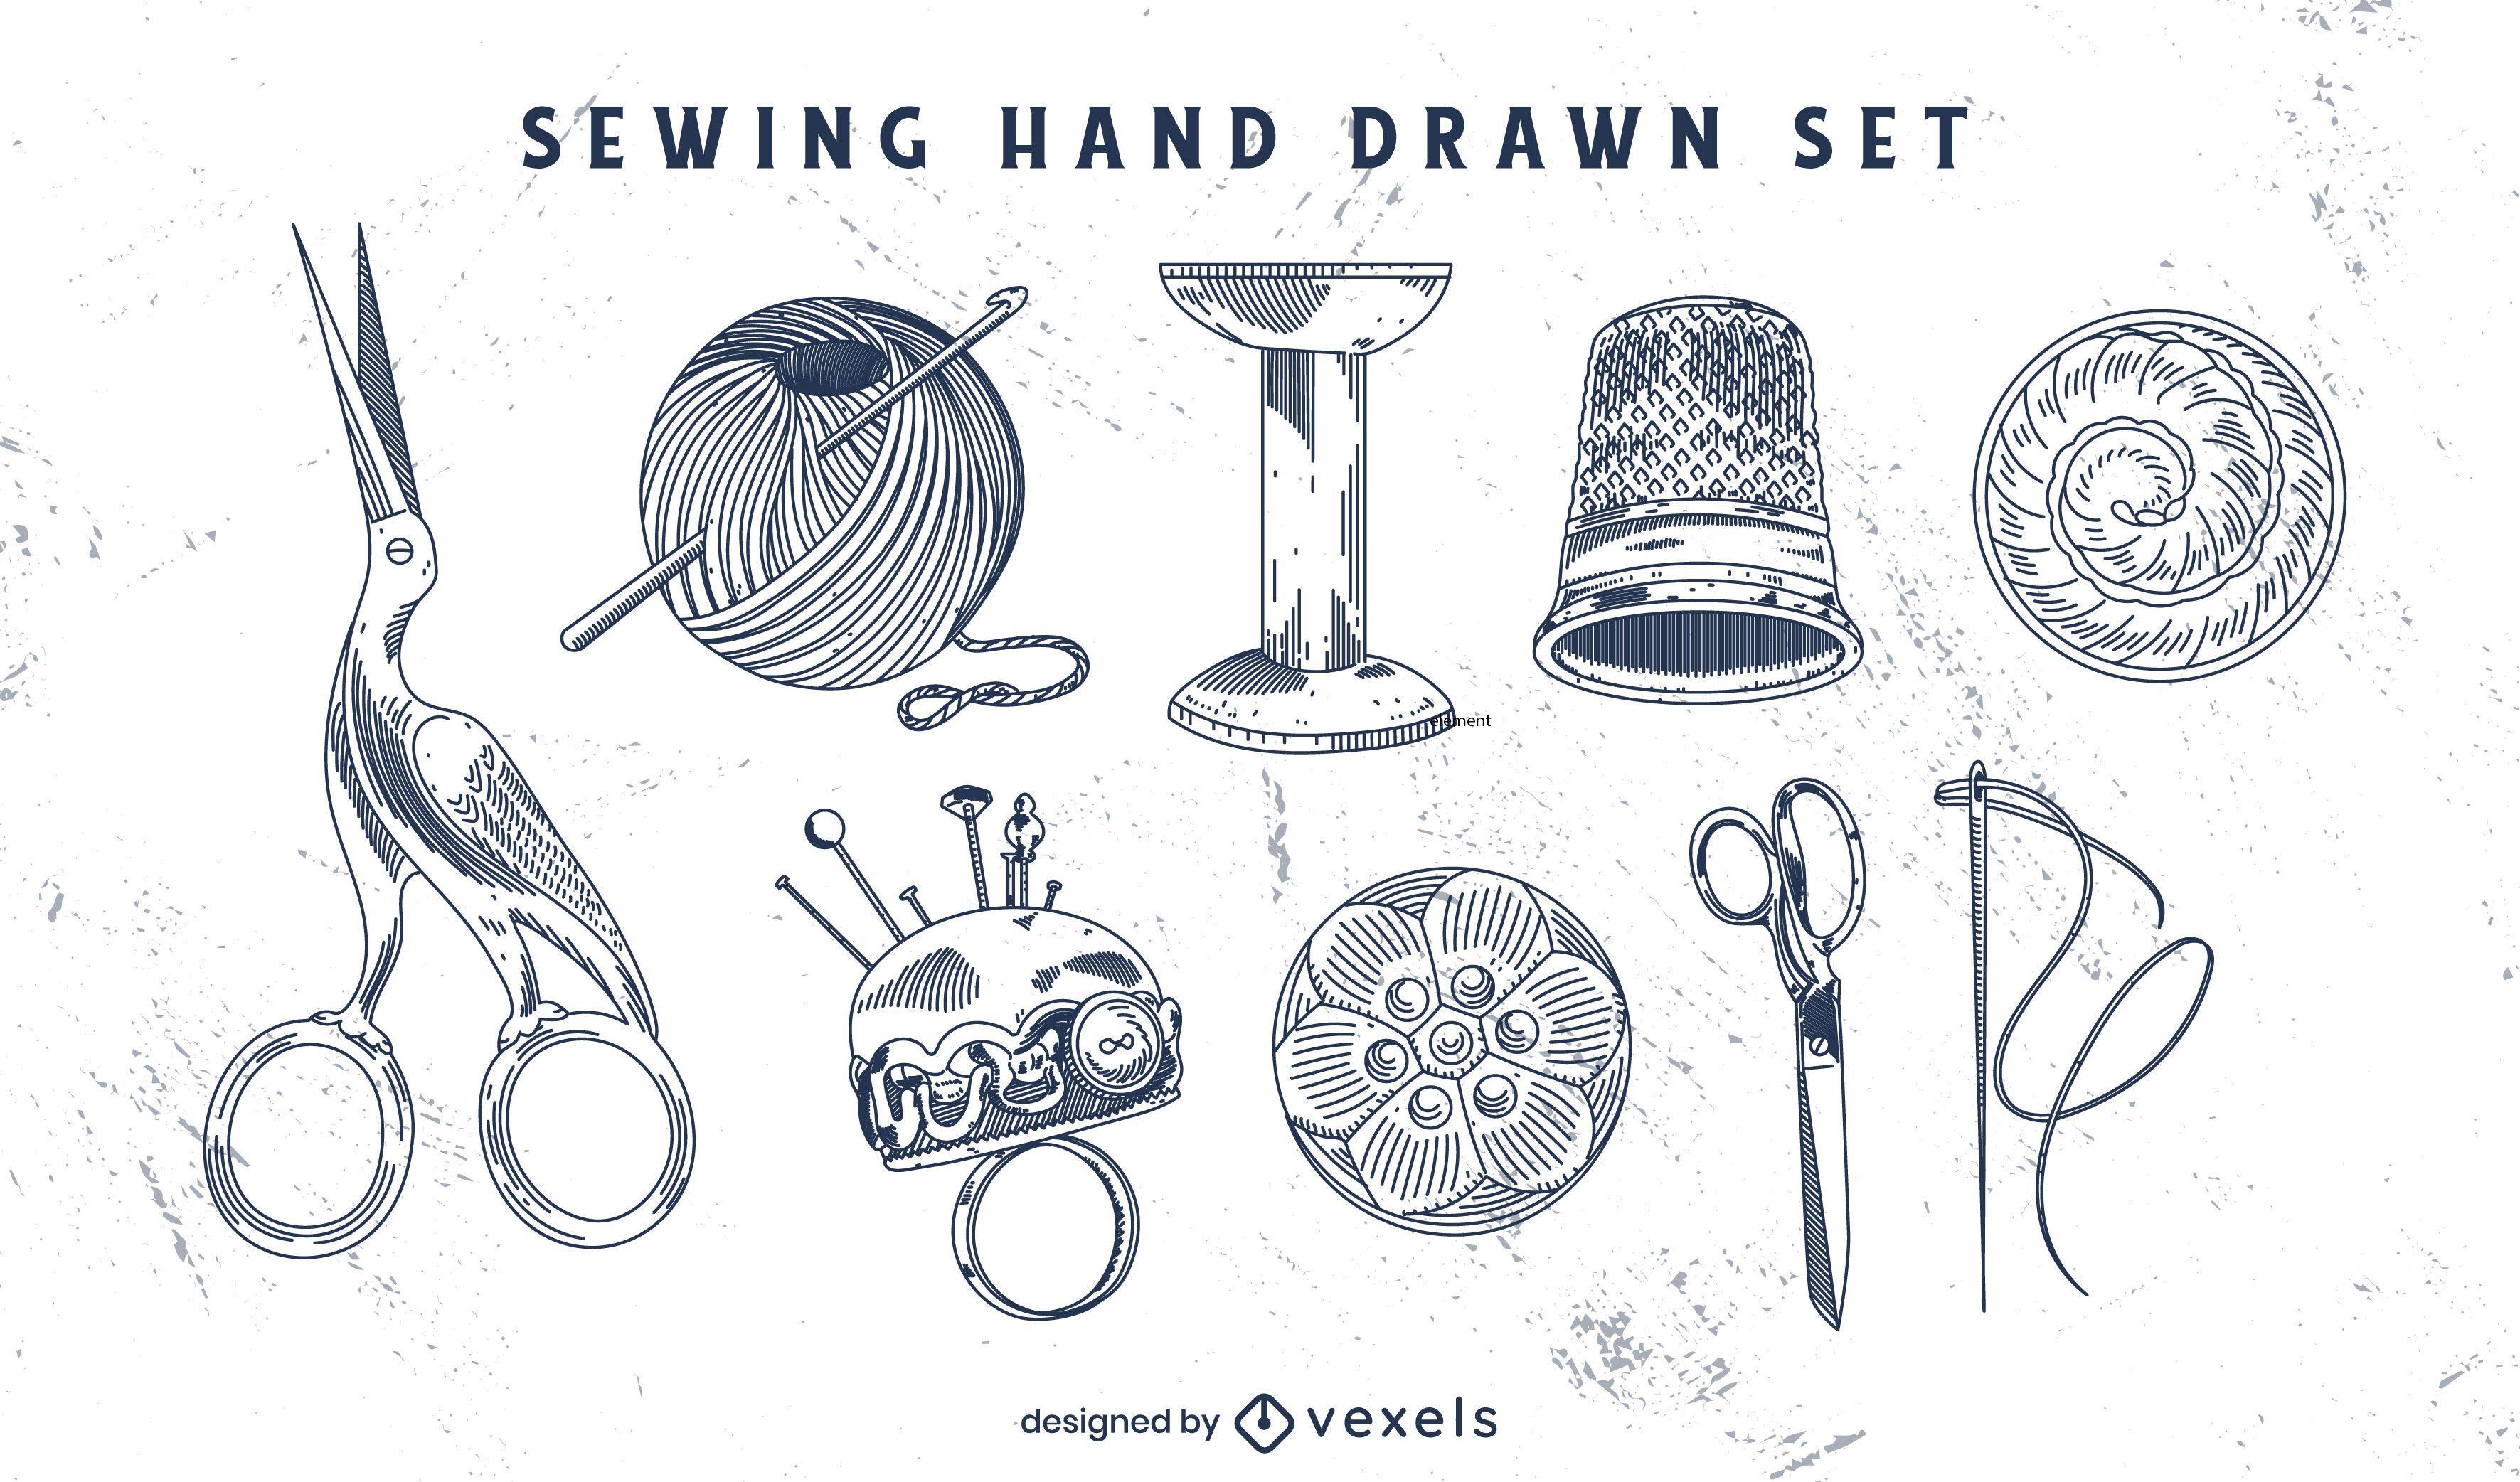 Sewing hand drawn elements set